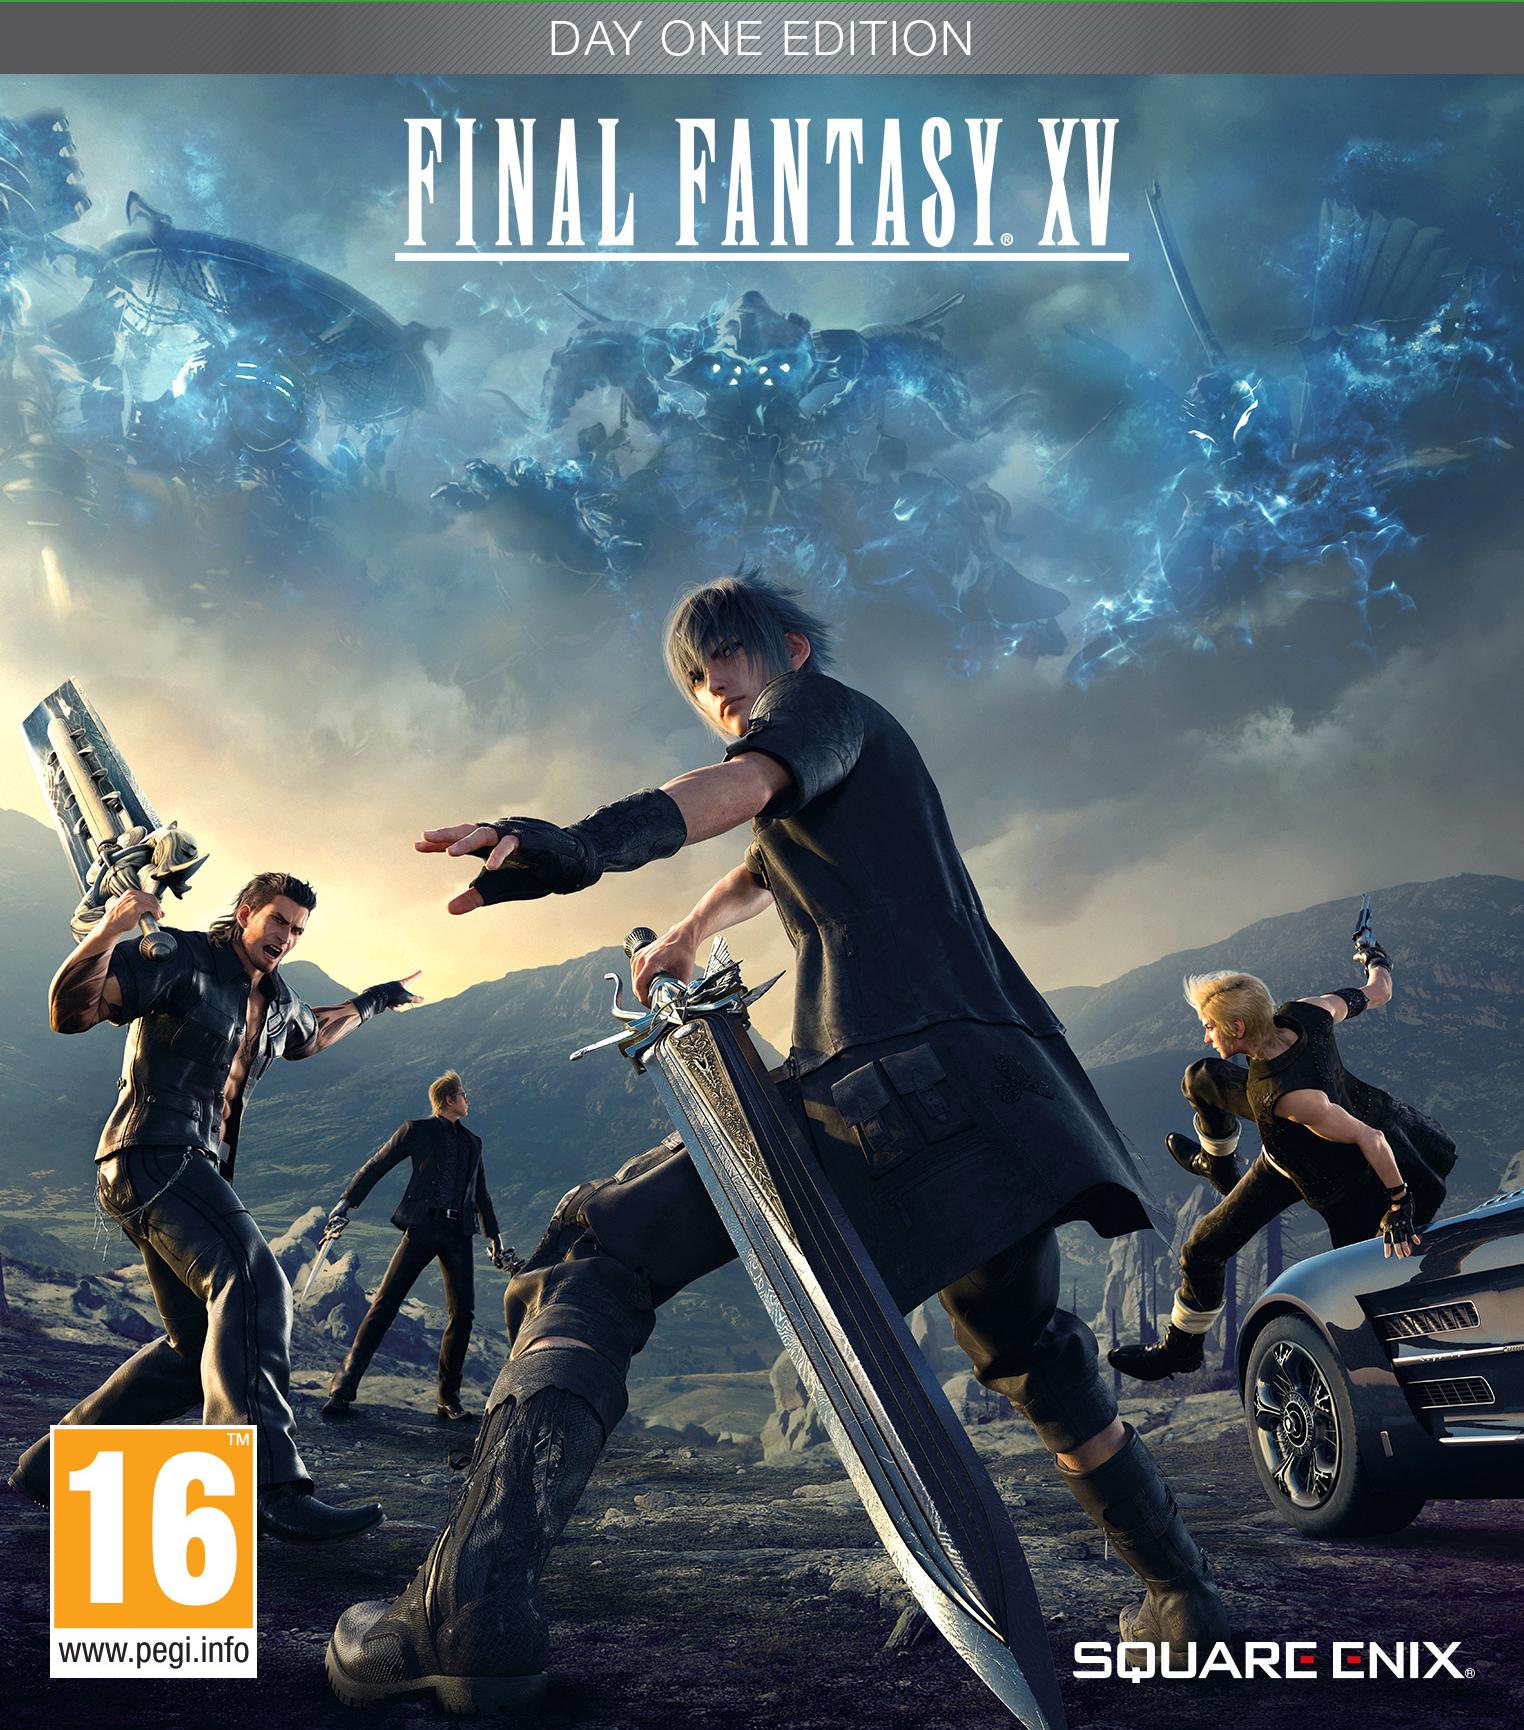 PC Final Fantasy XV 100% Game Save | Save Game File Download